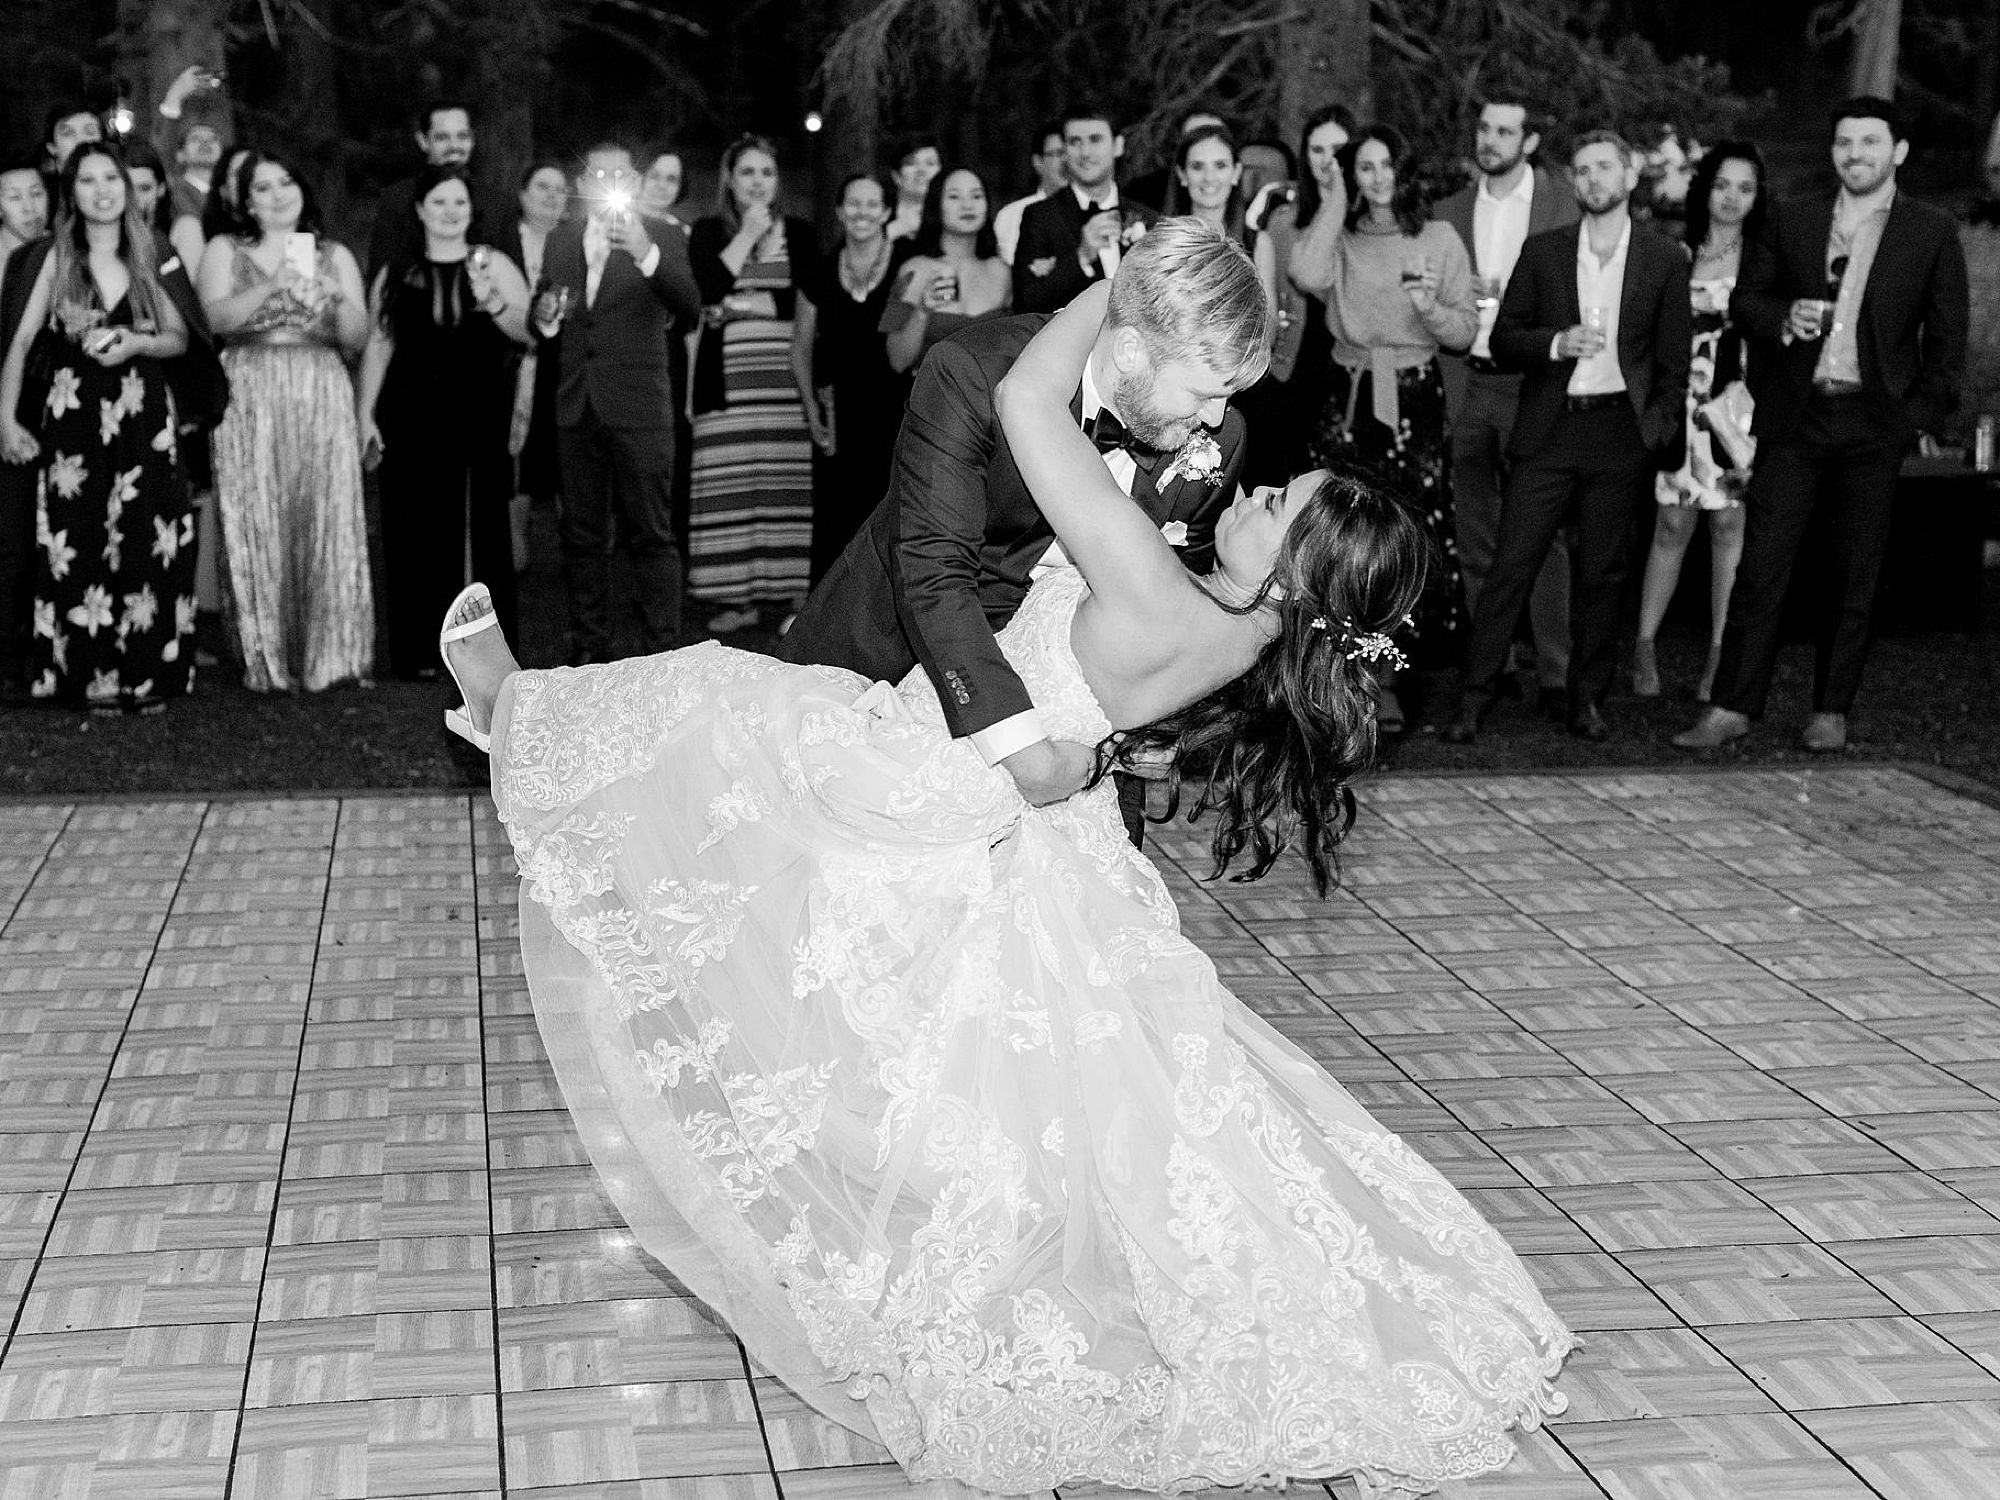 MITCHELLS MOUNTAIN MEADOWS Wedding - Ash Baumgartner - Phallina and Matt - Sierraville Wedding - Tahoe Wedding Photography_0032.jpg